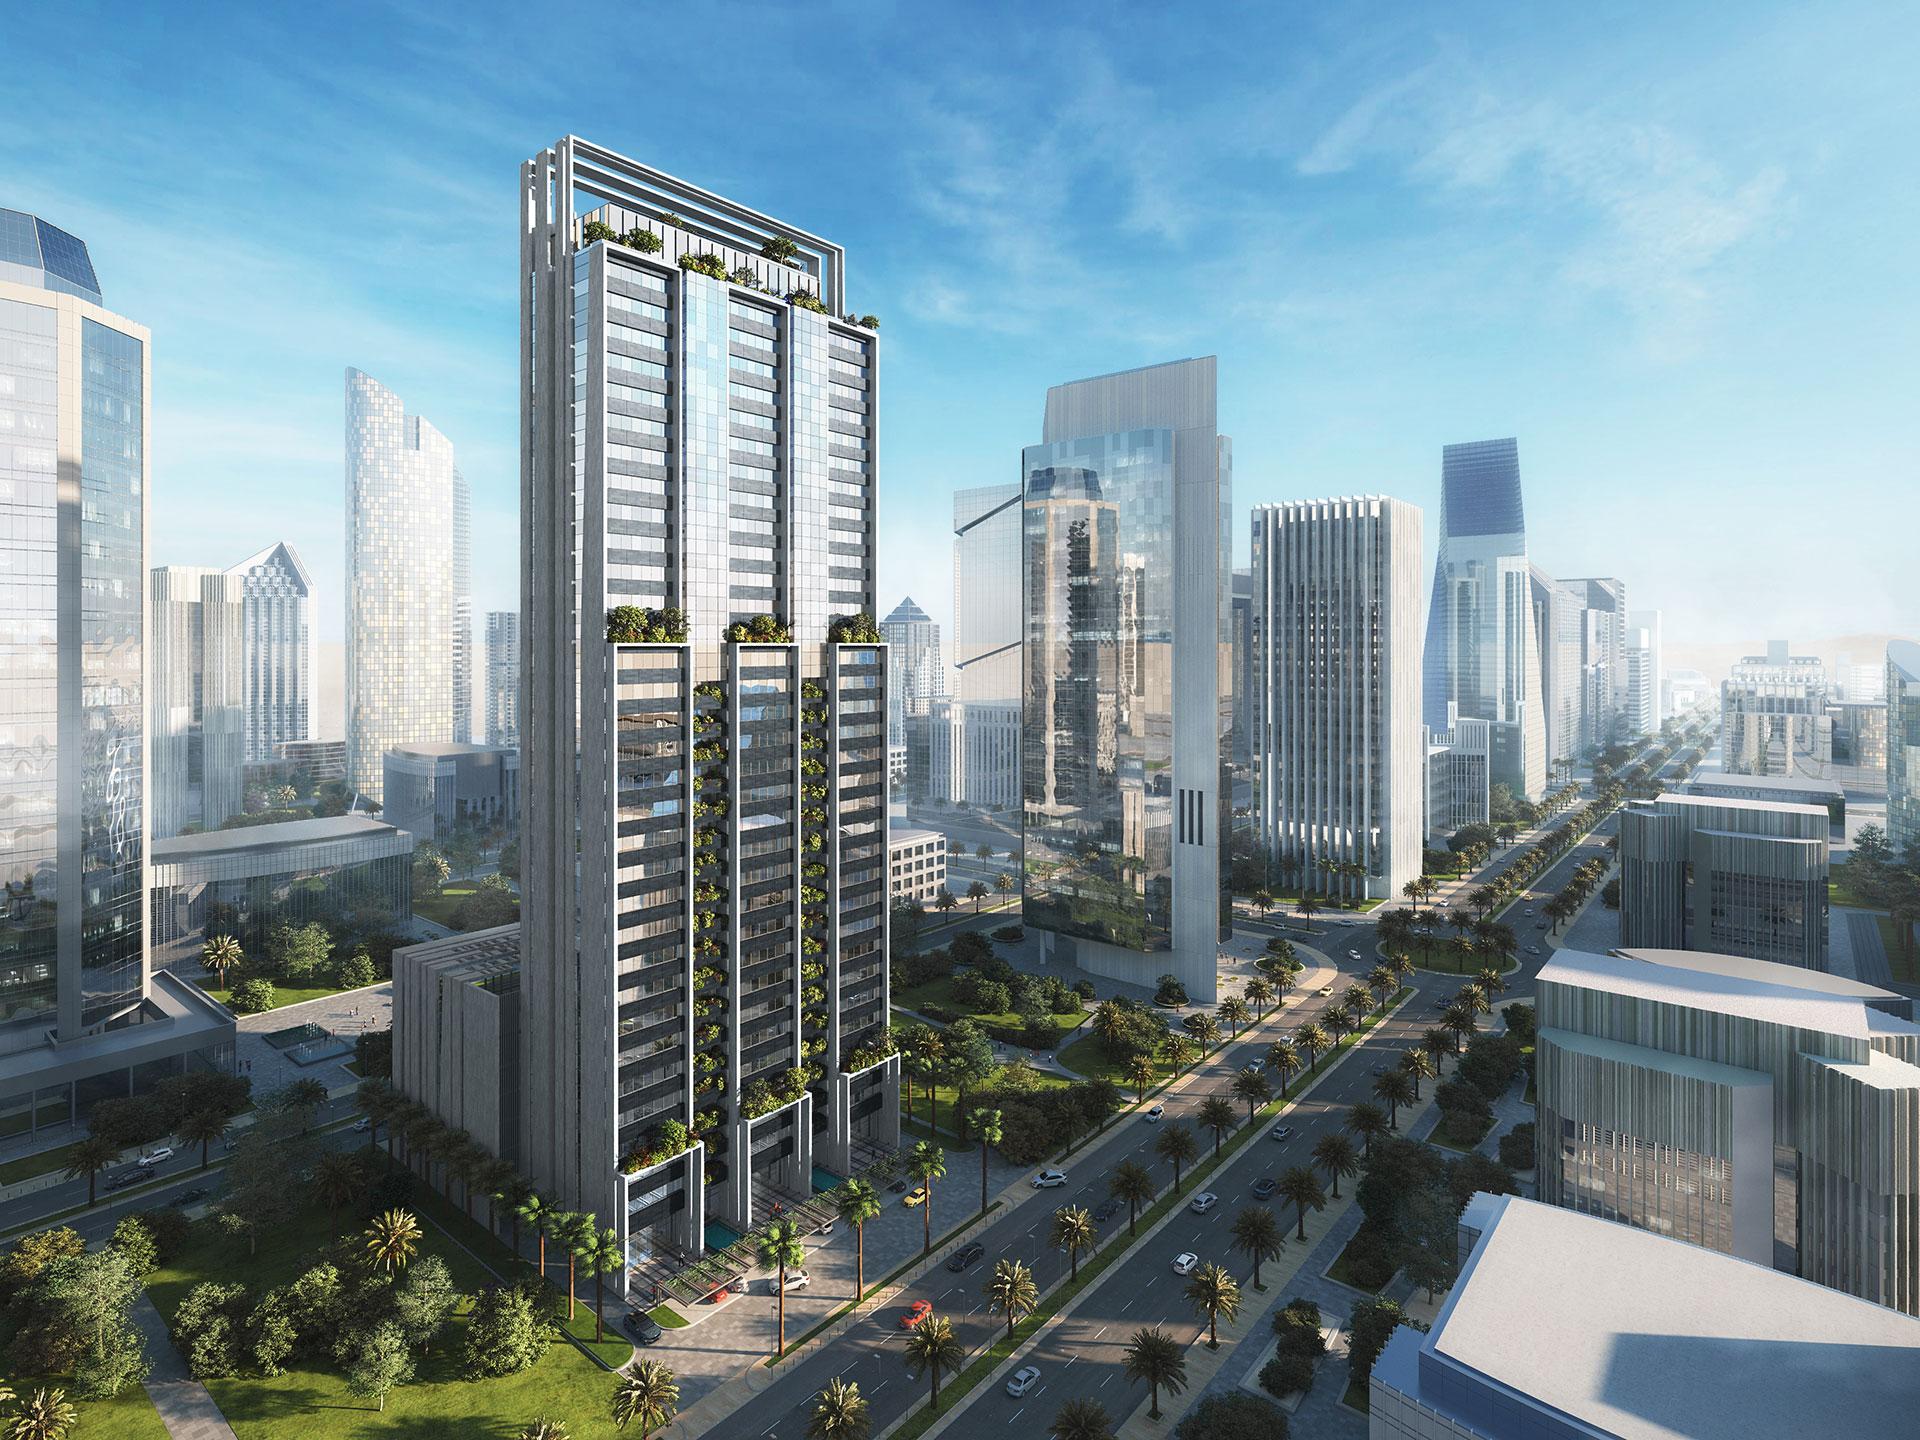 Capital Plaza / Kuwait / MNA international